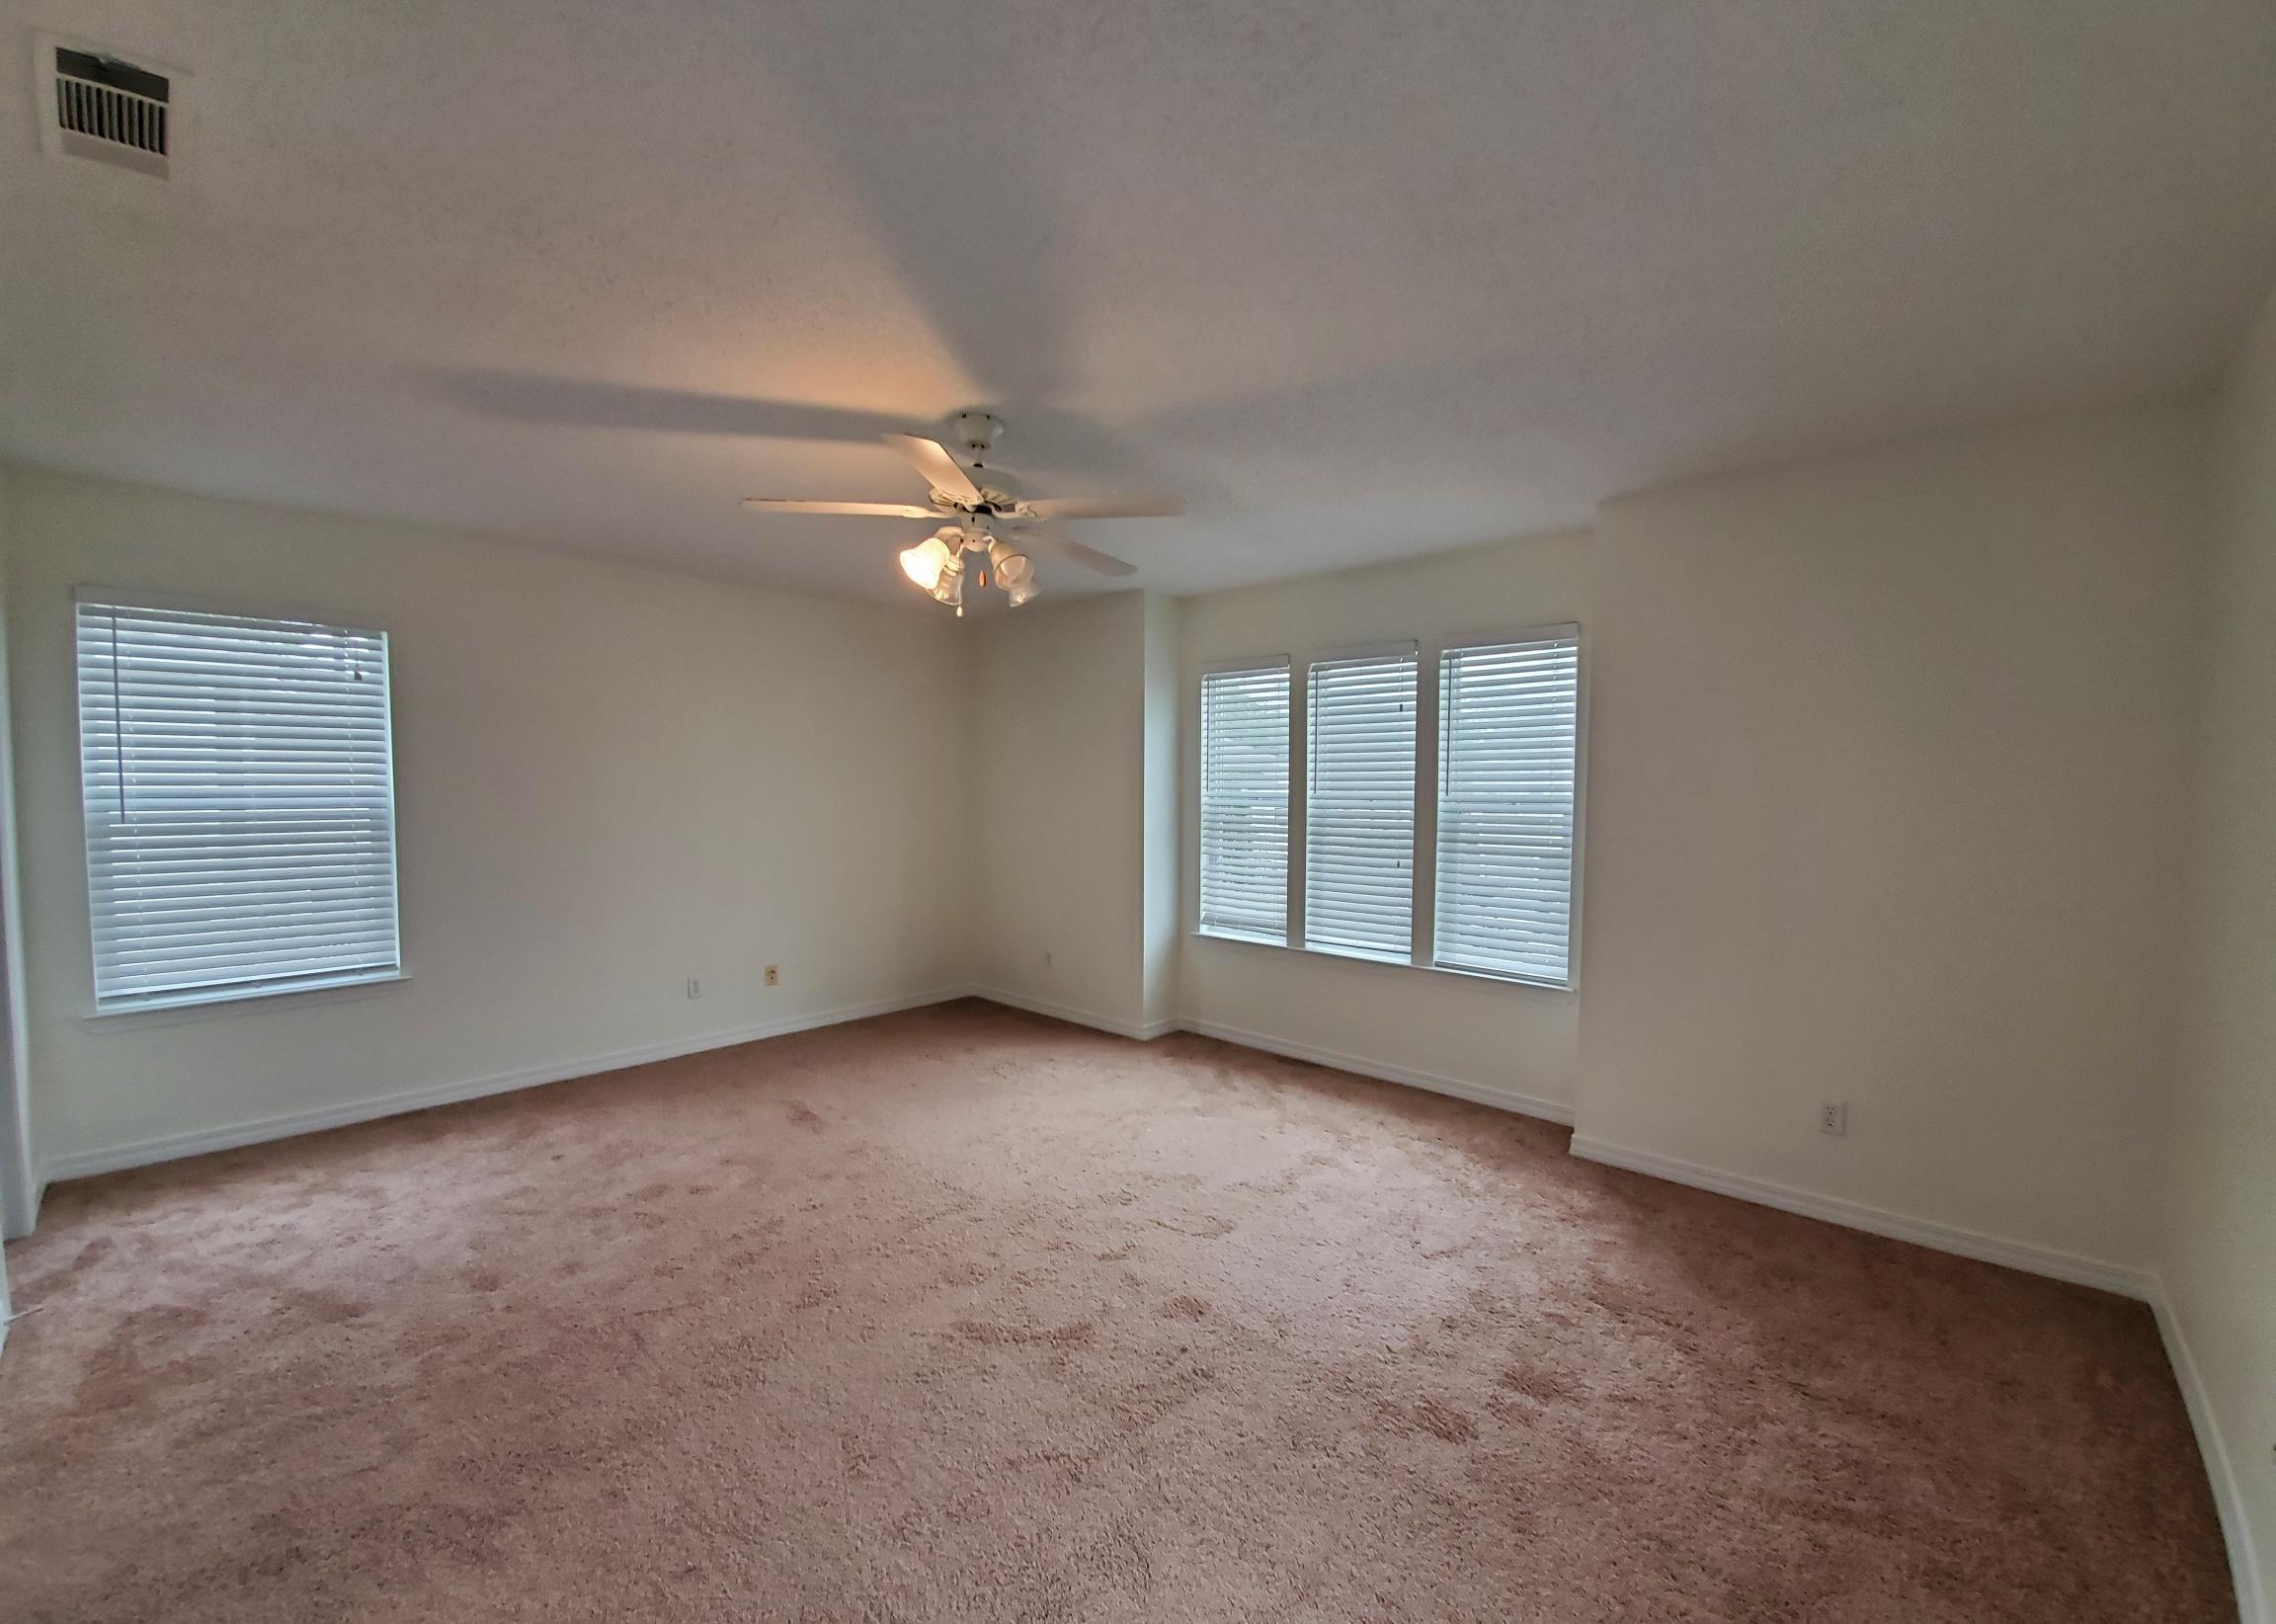 Photo of home for sale at 9 Enchanted, Santa Rosa Beach FL